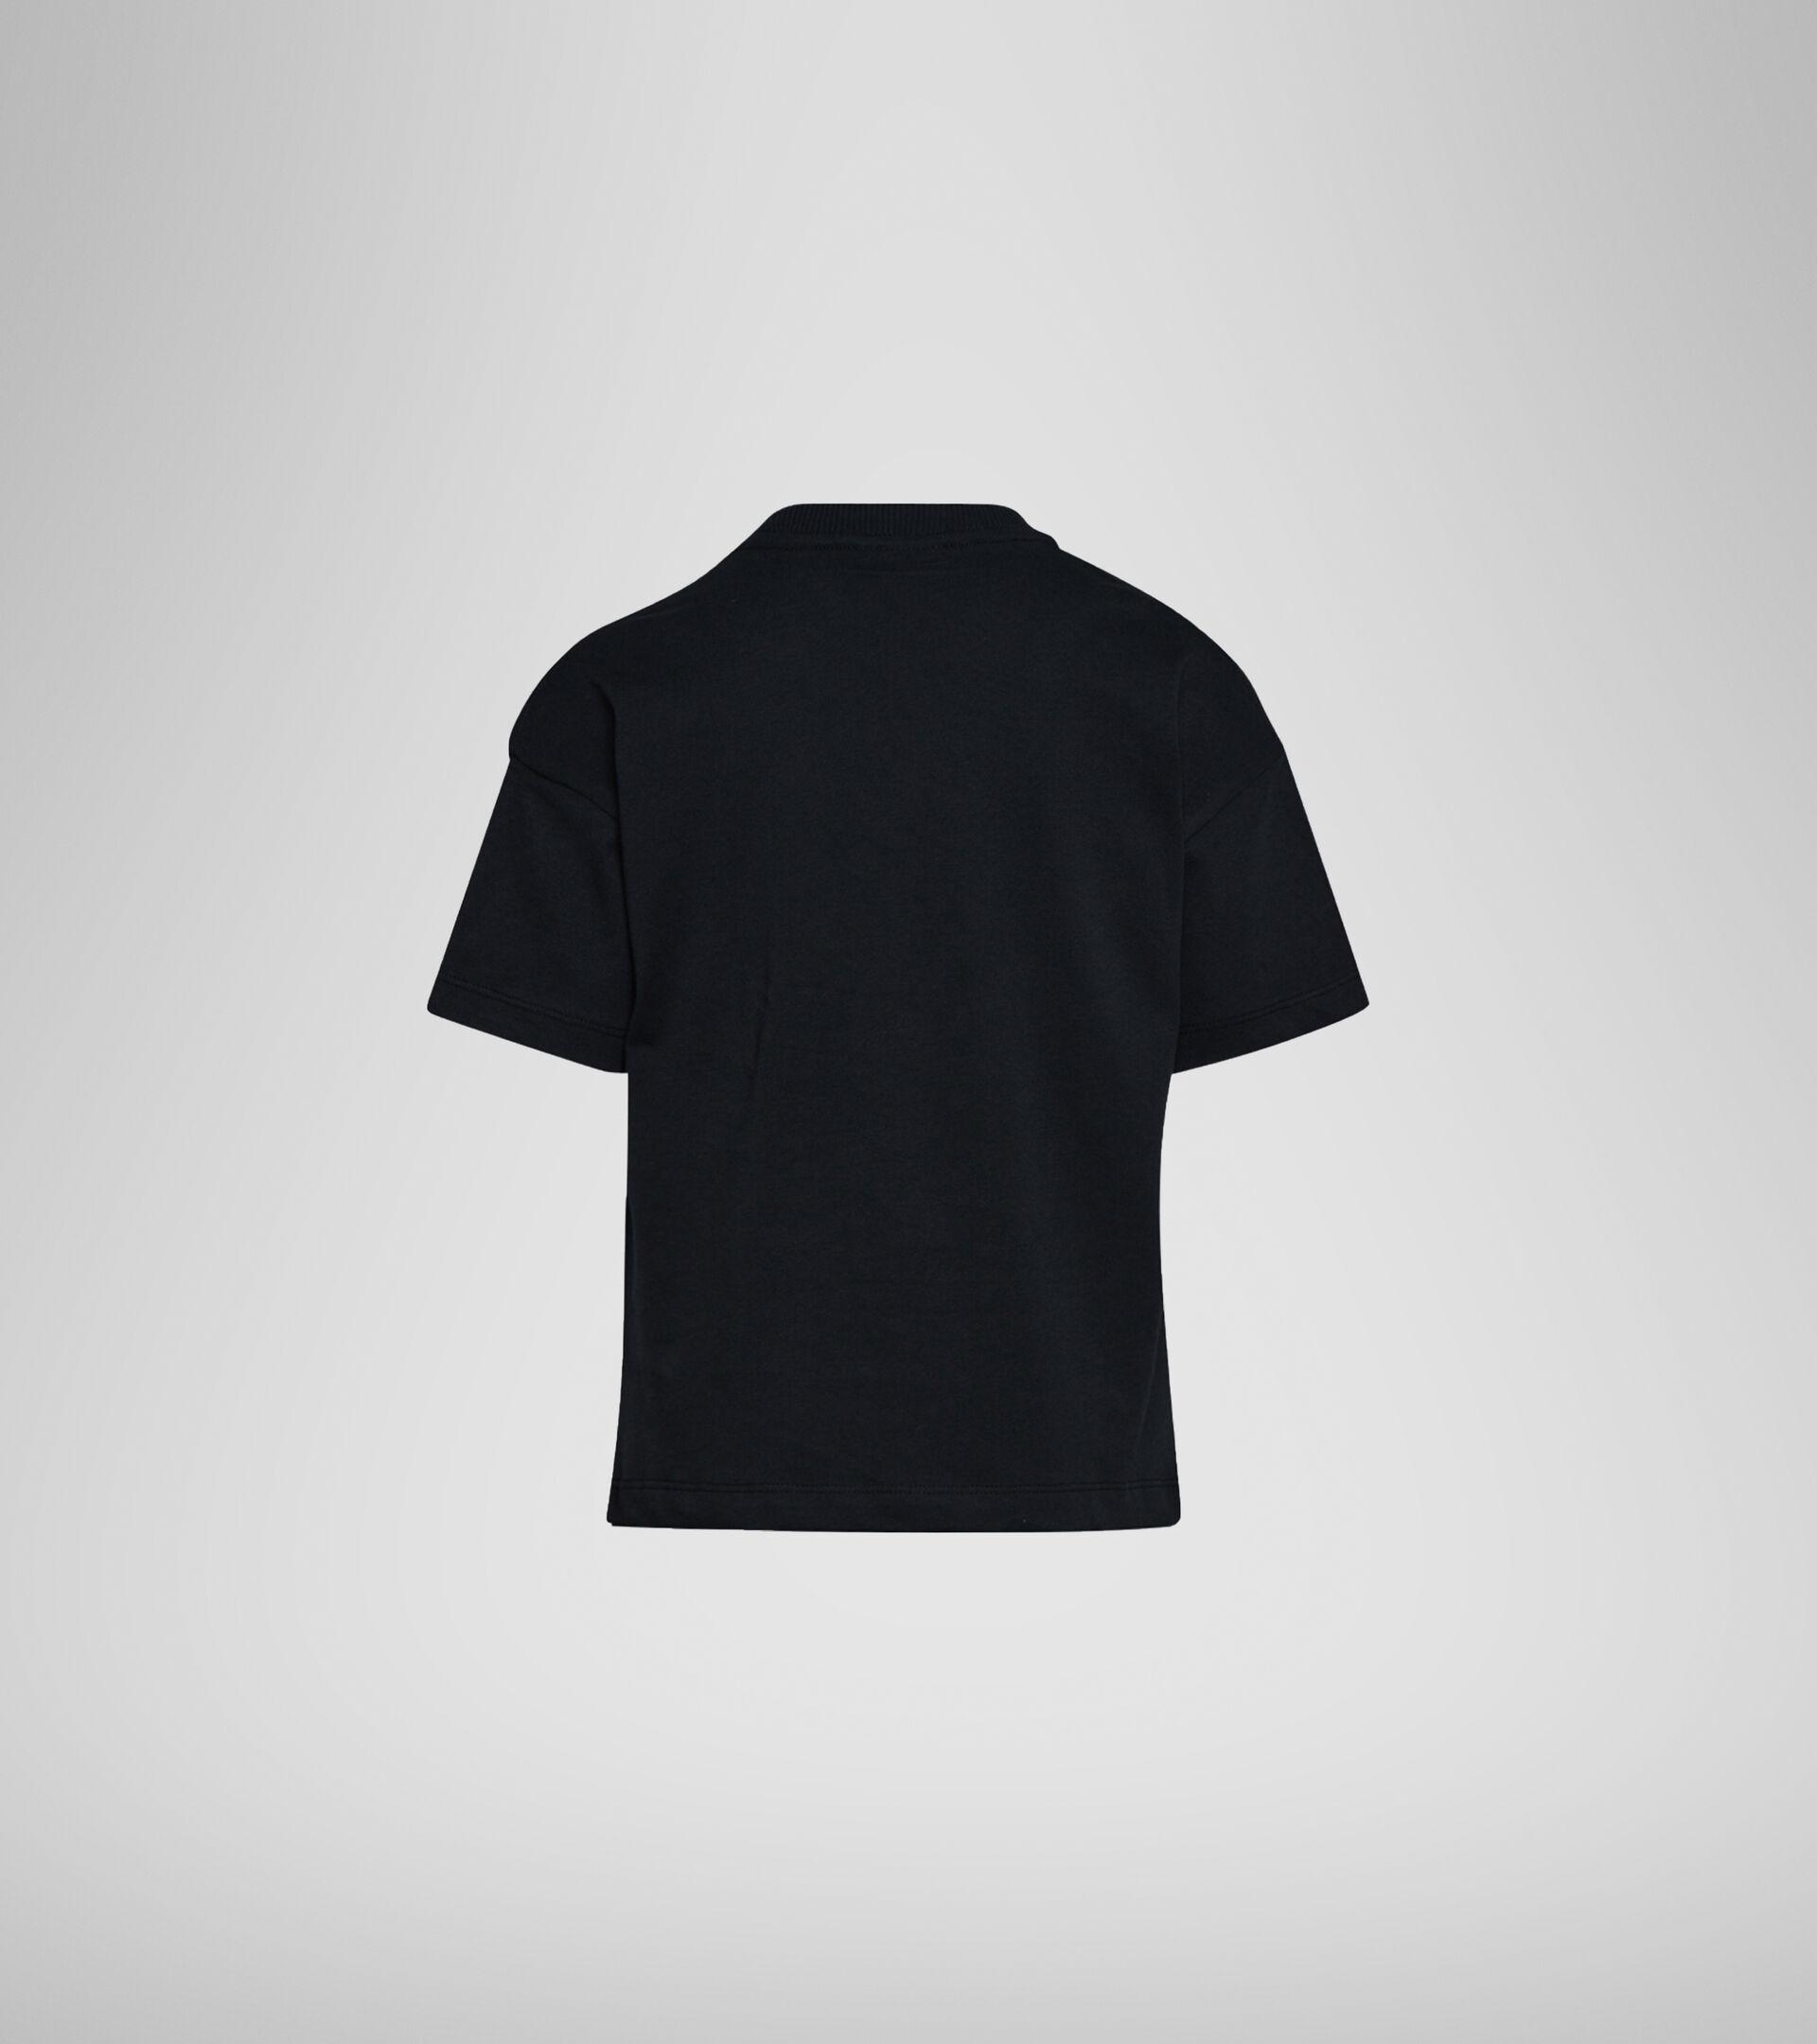 T-Shirt mit Logo -  Jungs und Mädchen JU. T-SHIRT SS ELEMENTS SCHWARZ - Diadora